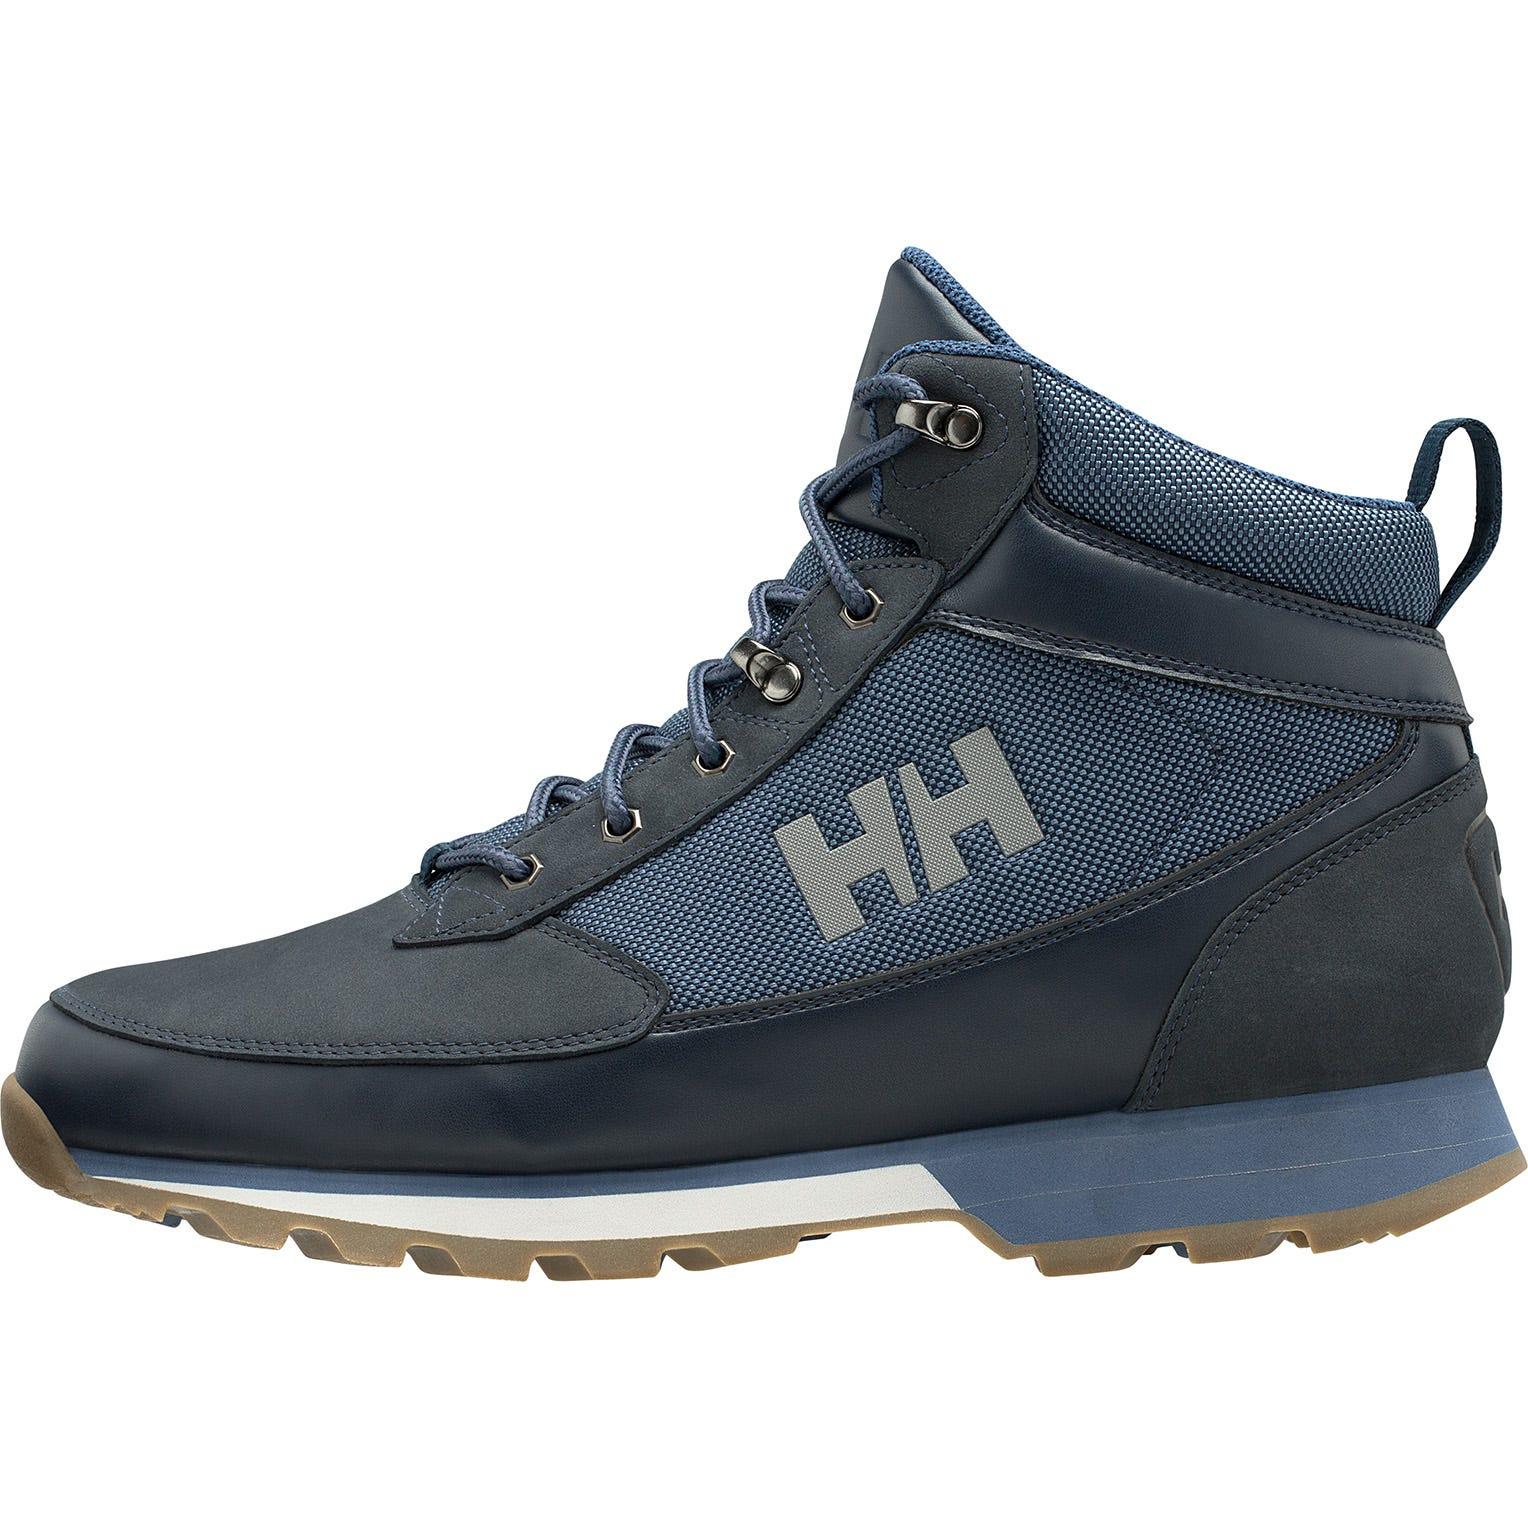 Helly Hansen Chilcotin Mens Winter Boot Navy 40.5/7.5